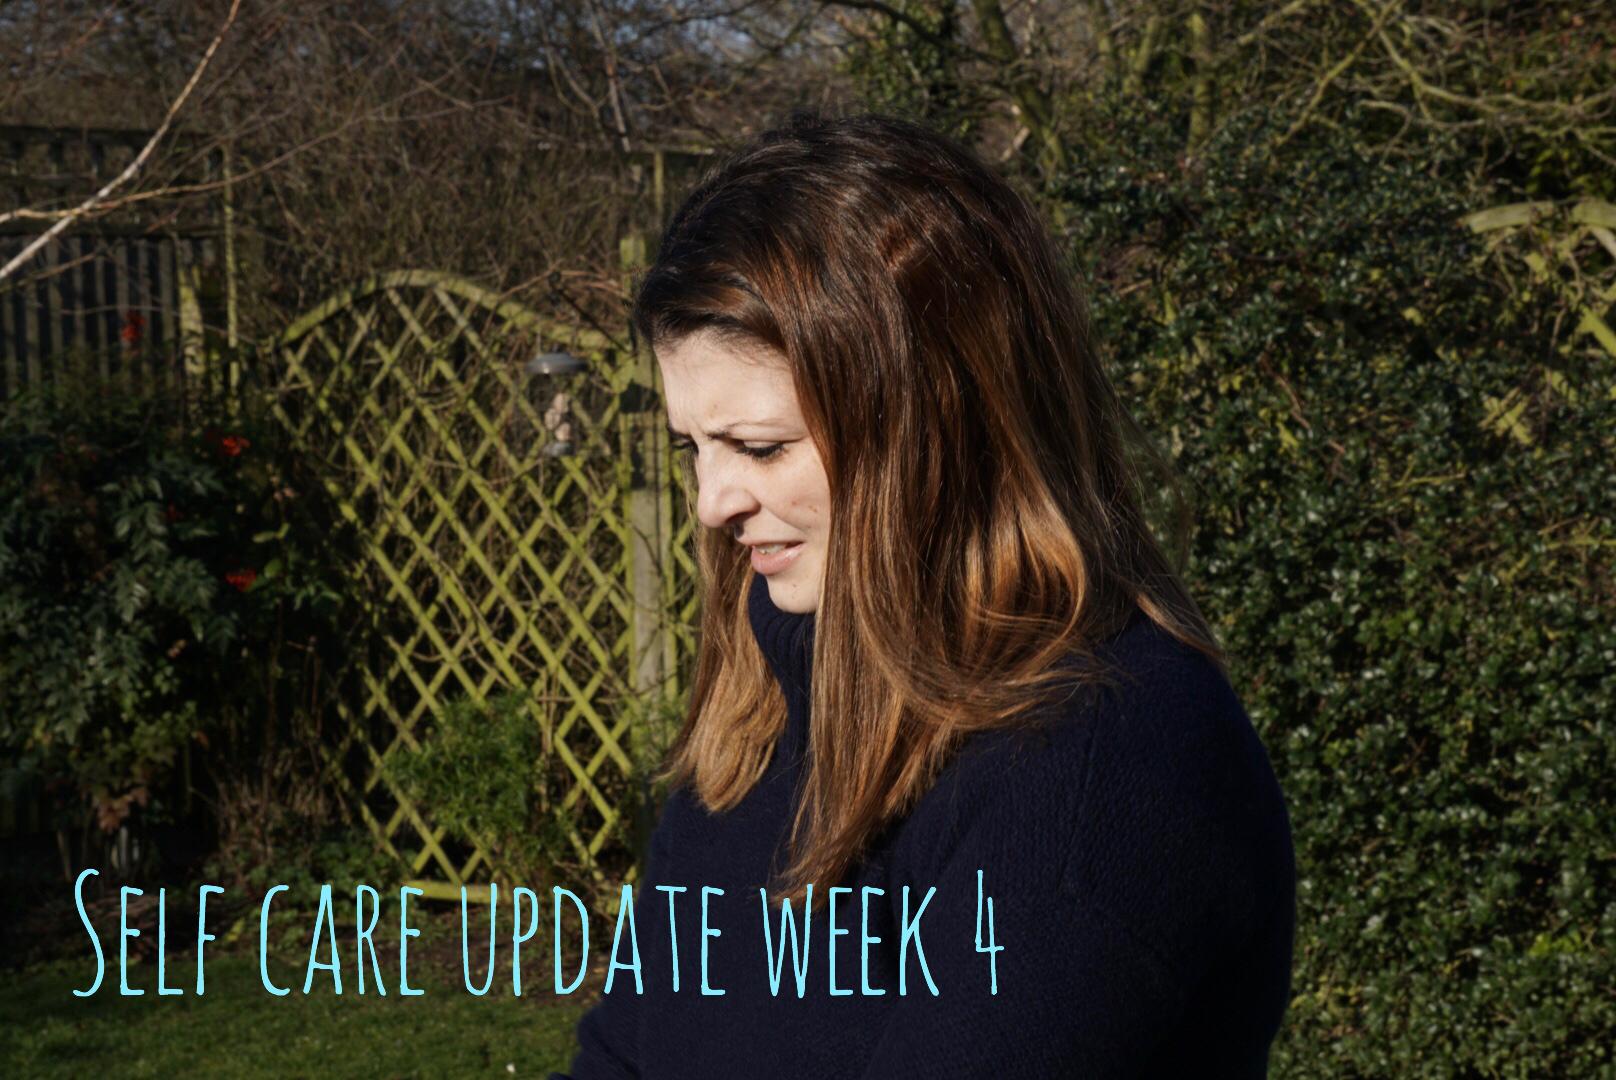 Self Care Week 4 Update graphic